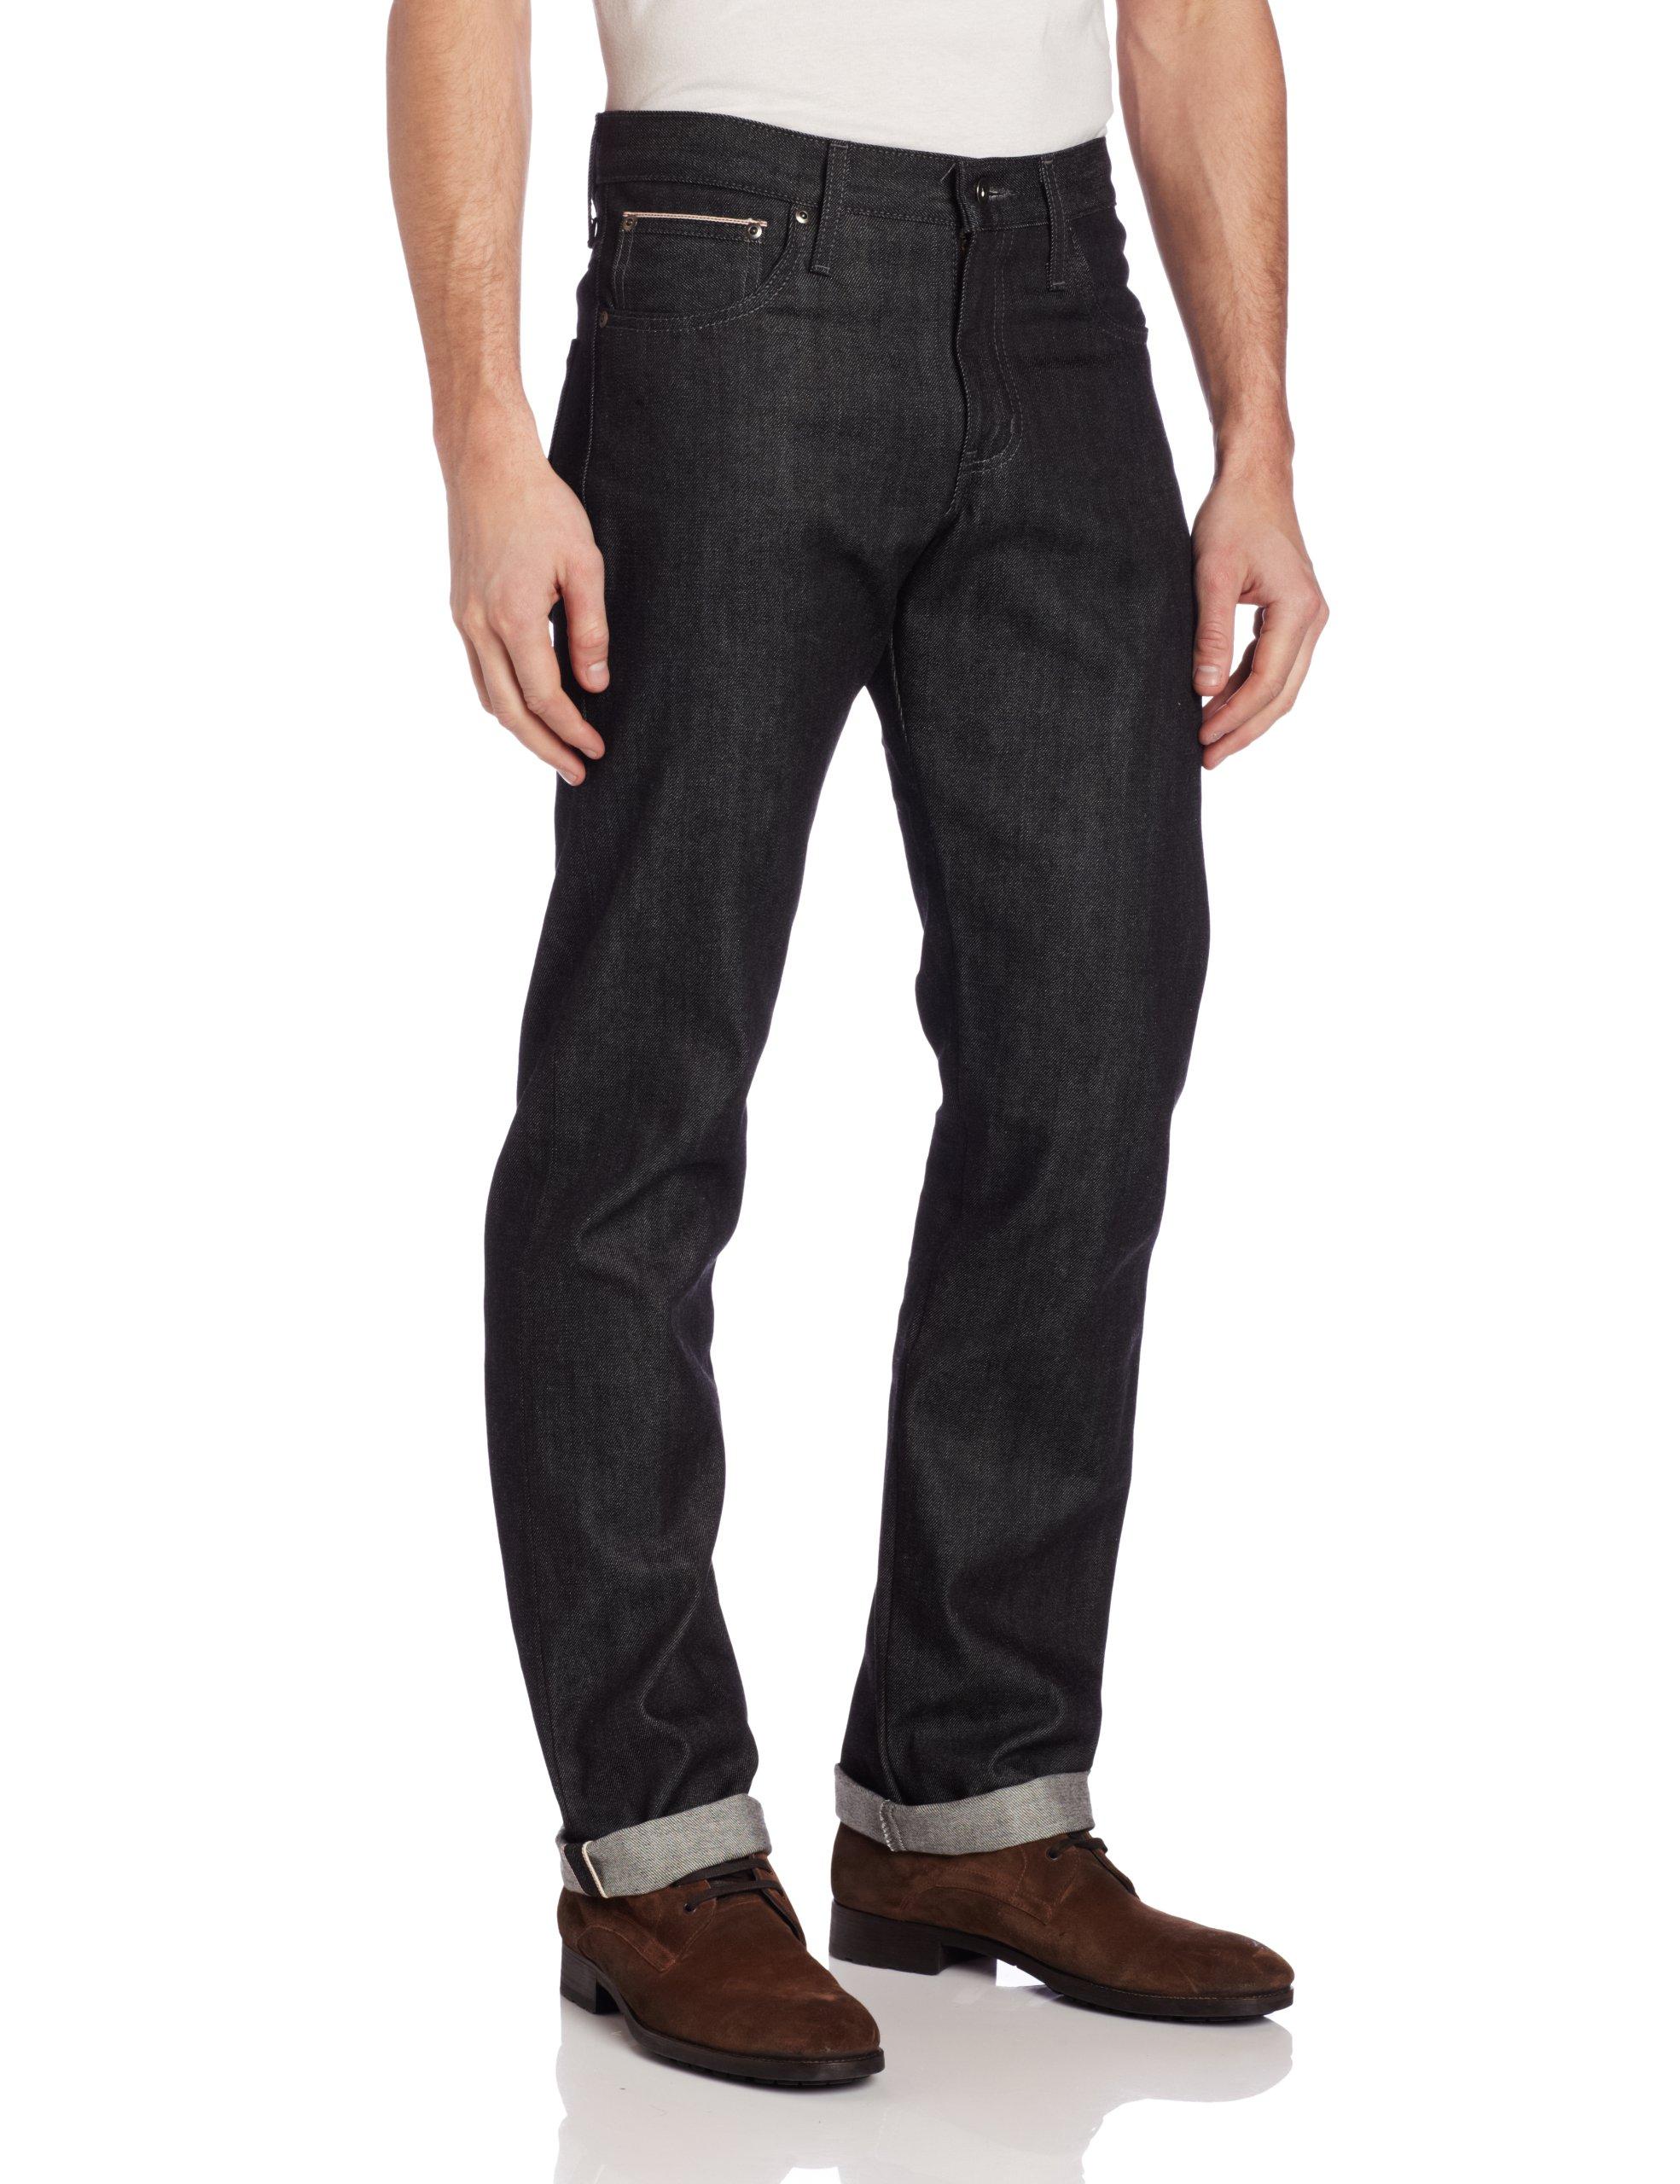 Naked & Famous Denim Men's SlimGuy Mid Rise Slim Fit Jean In Black Selvedge, Black Selvedge, 29x35